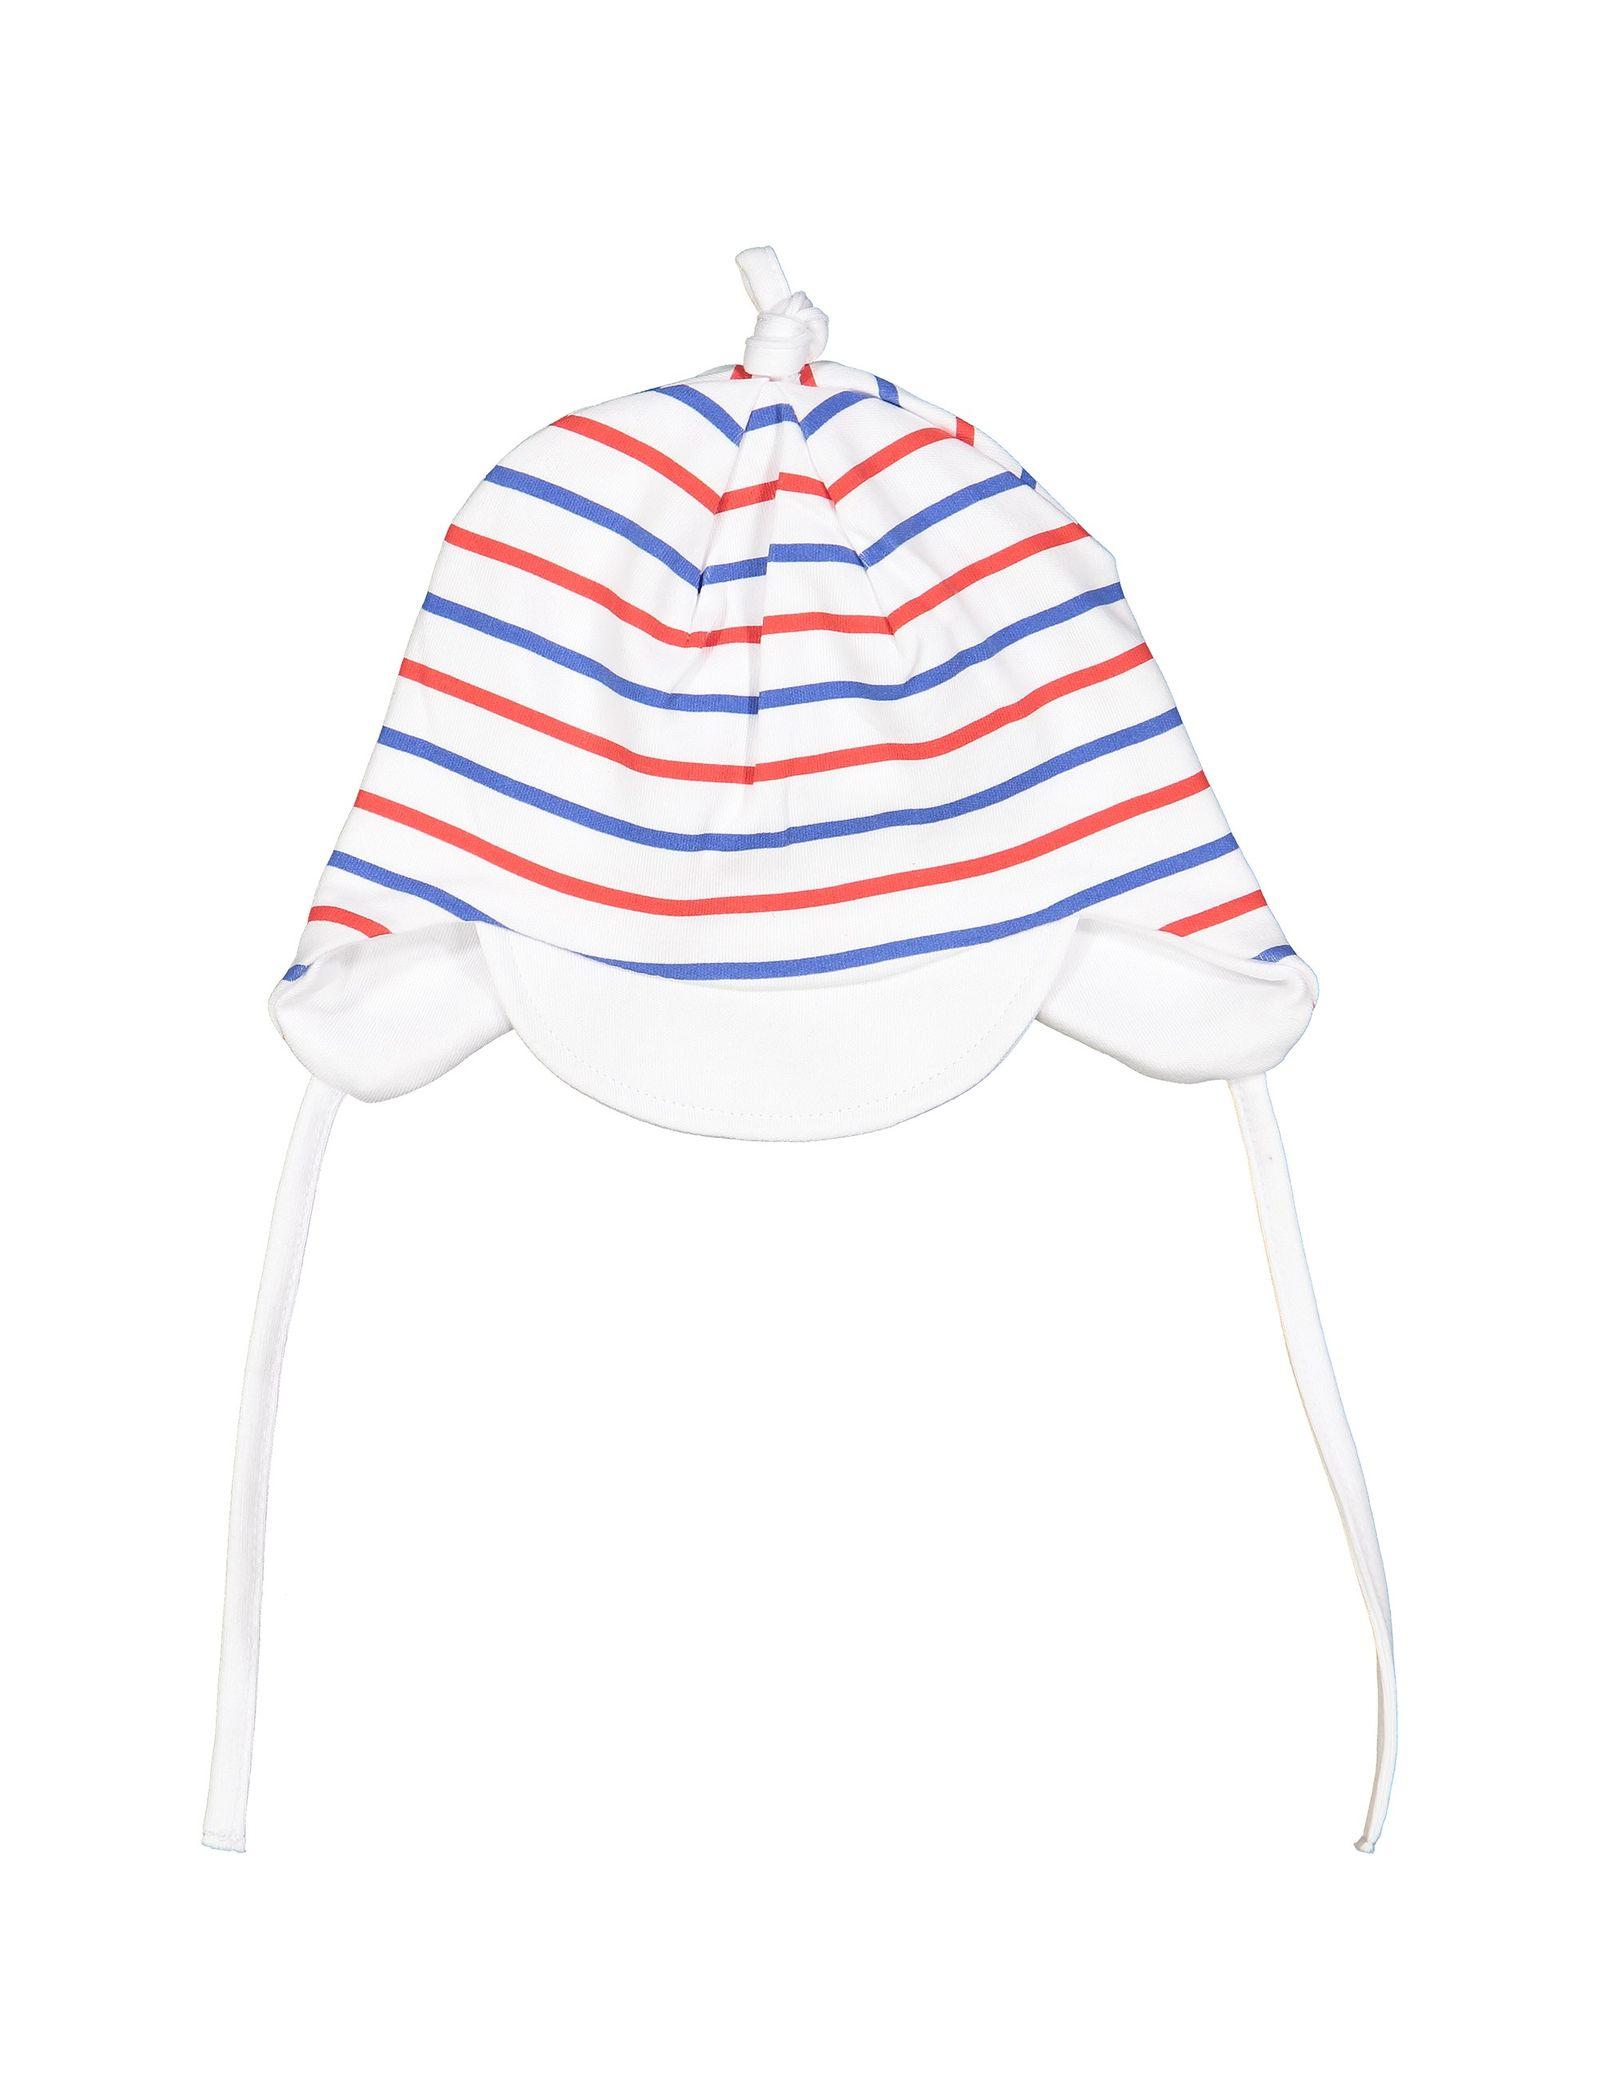 کلاه نخی طرح دار نوزادی پسرانه - ایدکس - سفيد - 1